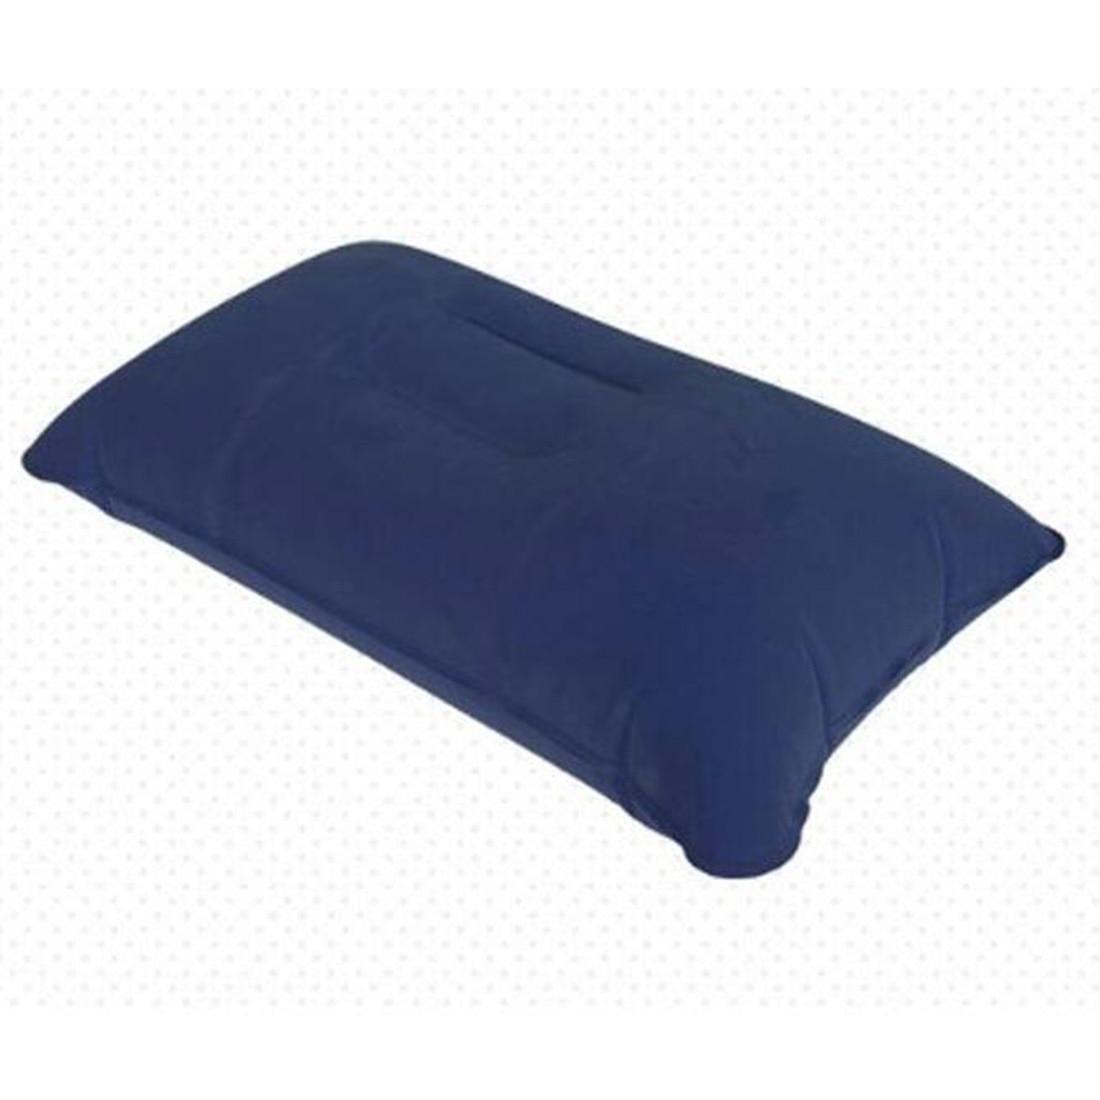 Portable Inflatable Travel Air Cushions 5